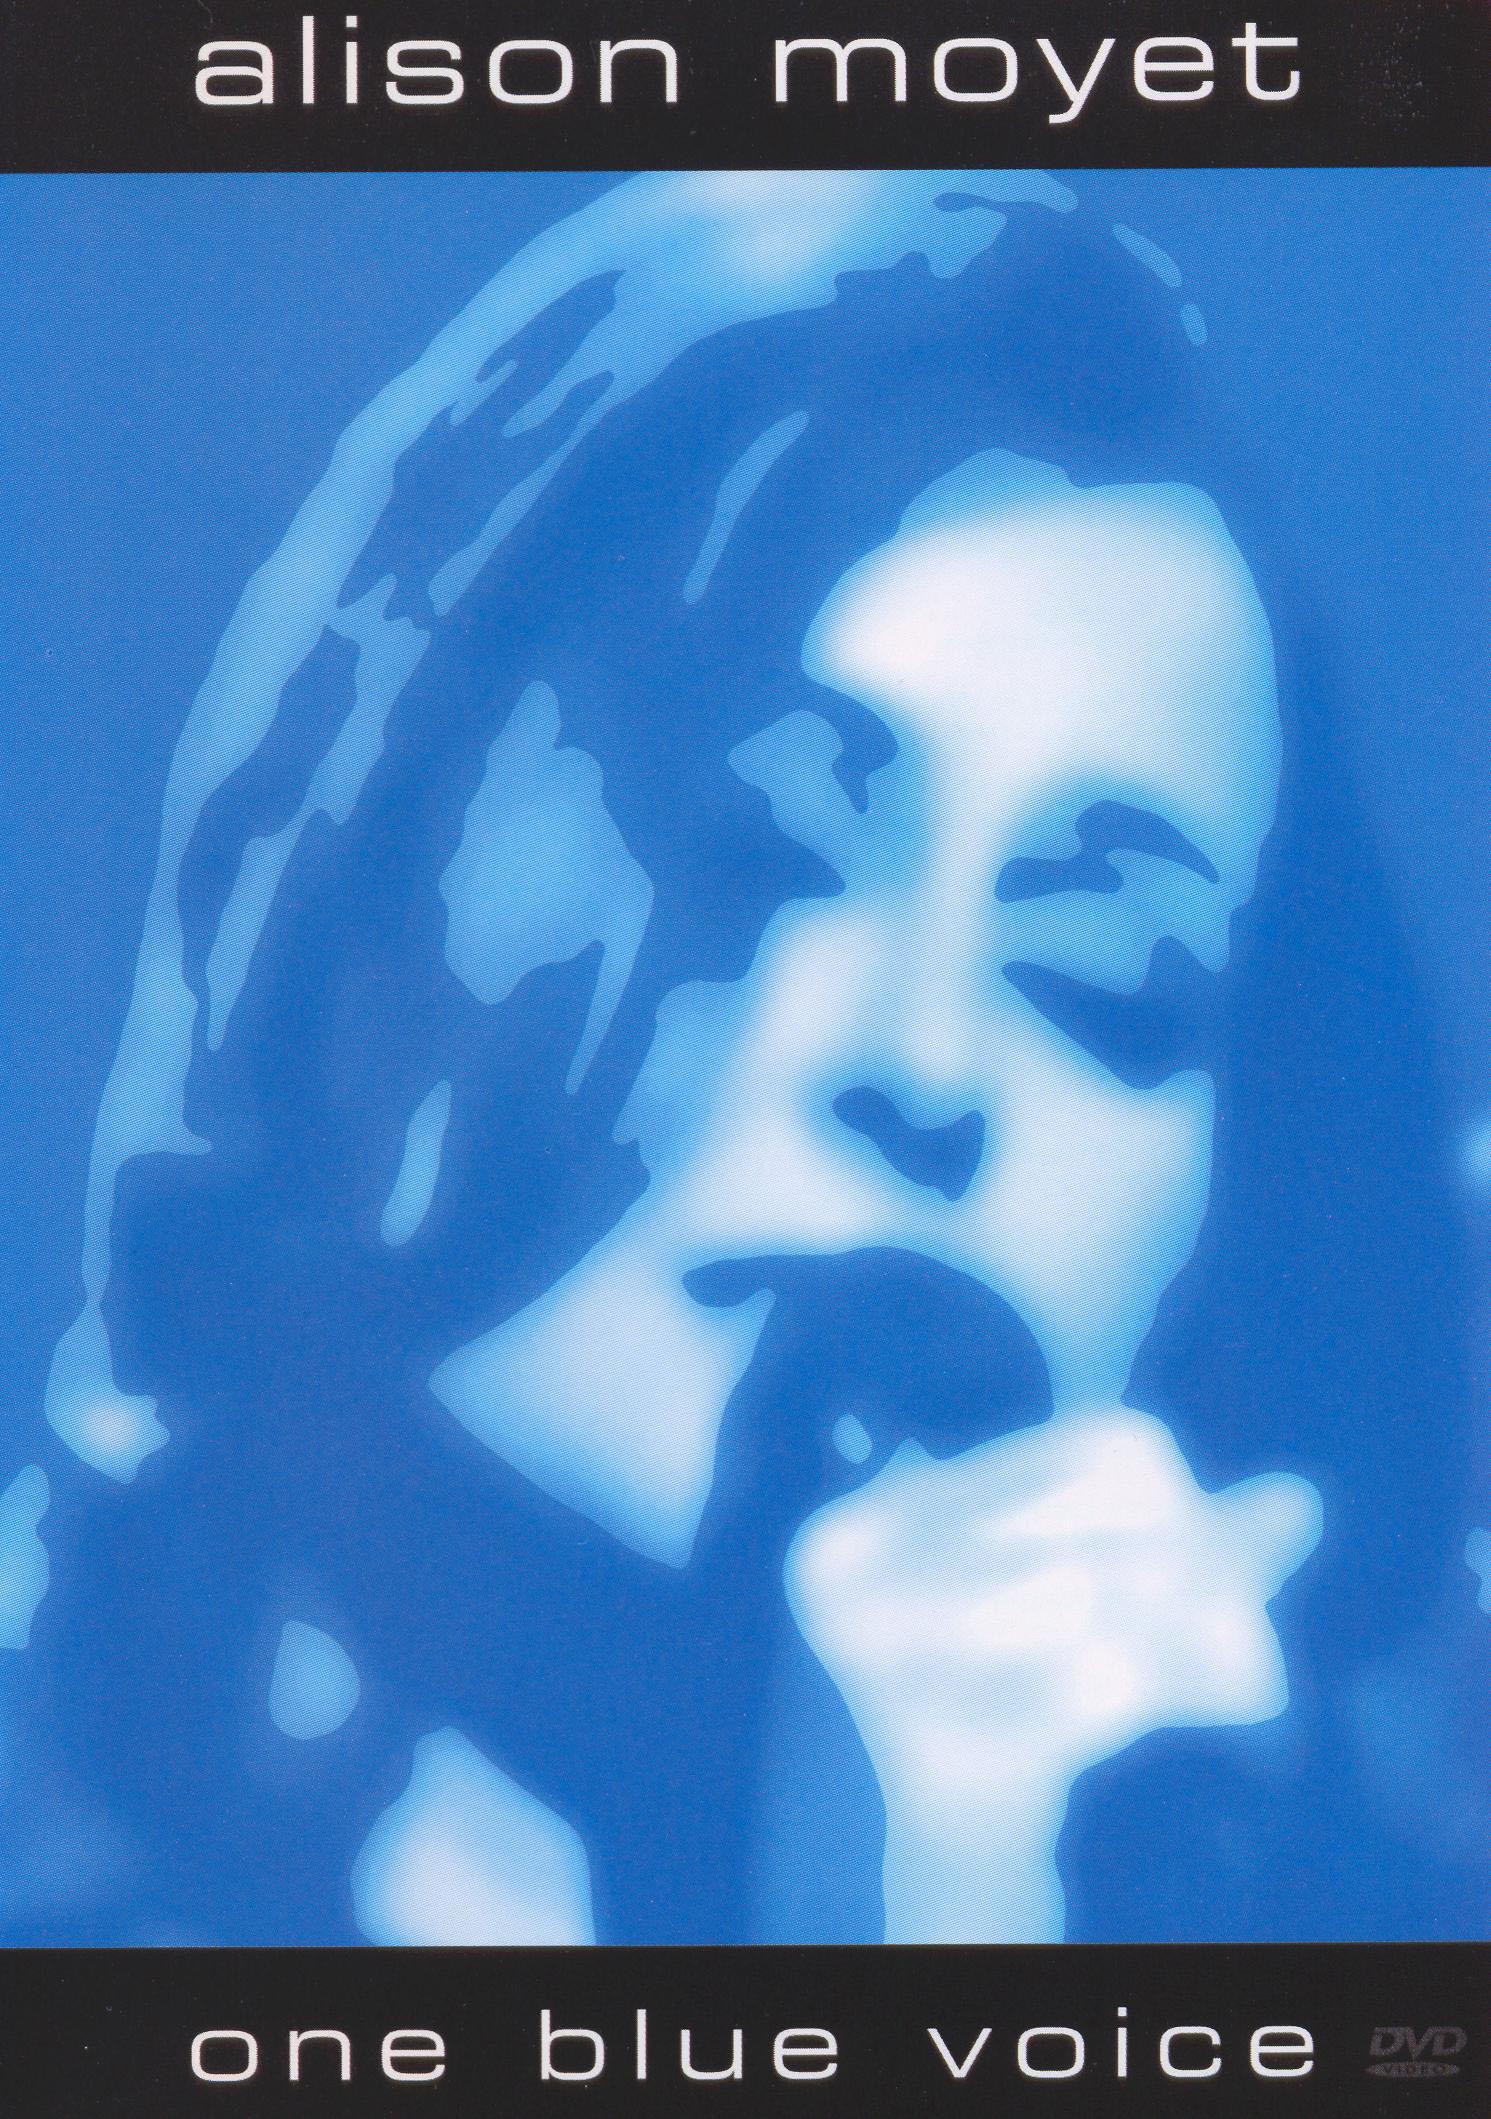 Alison Moyet: One Blue Voice